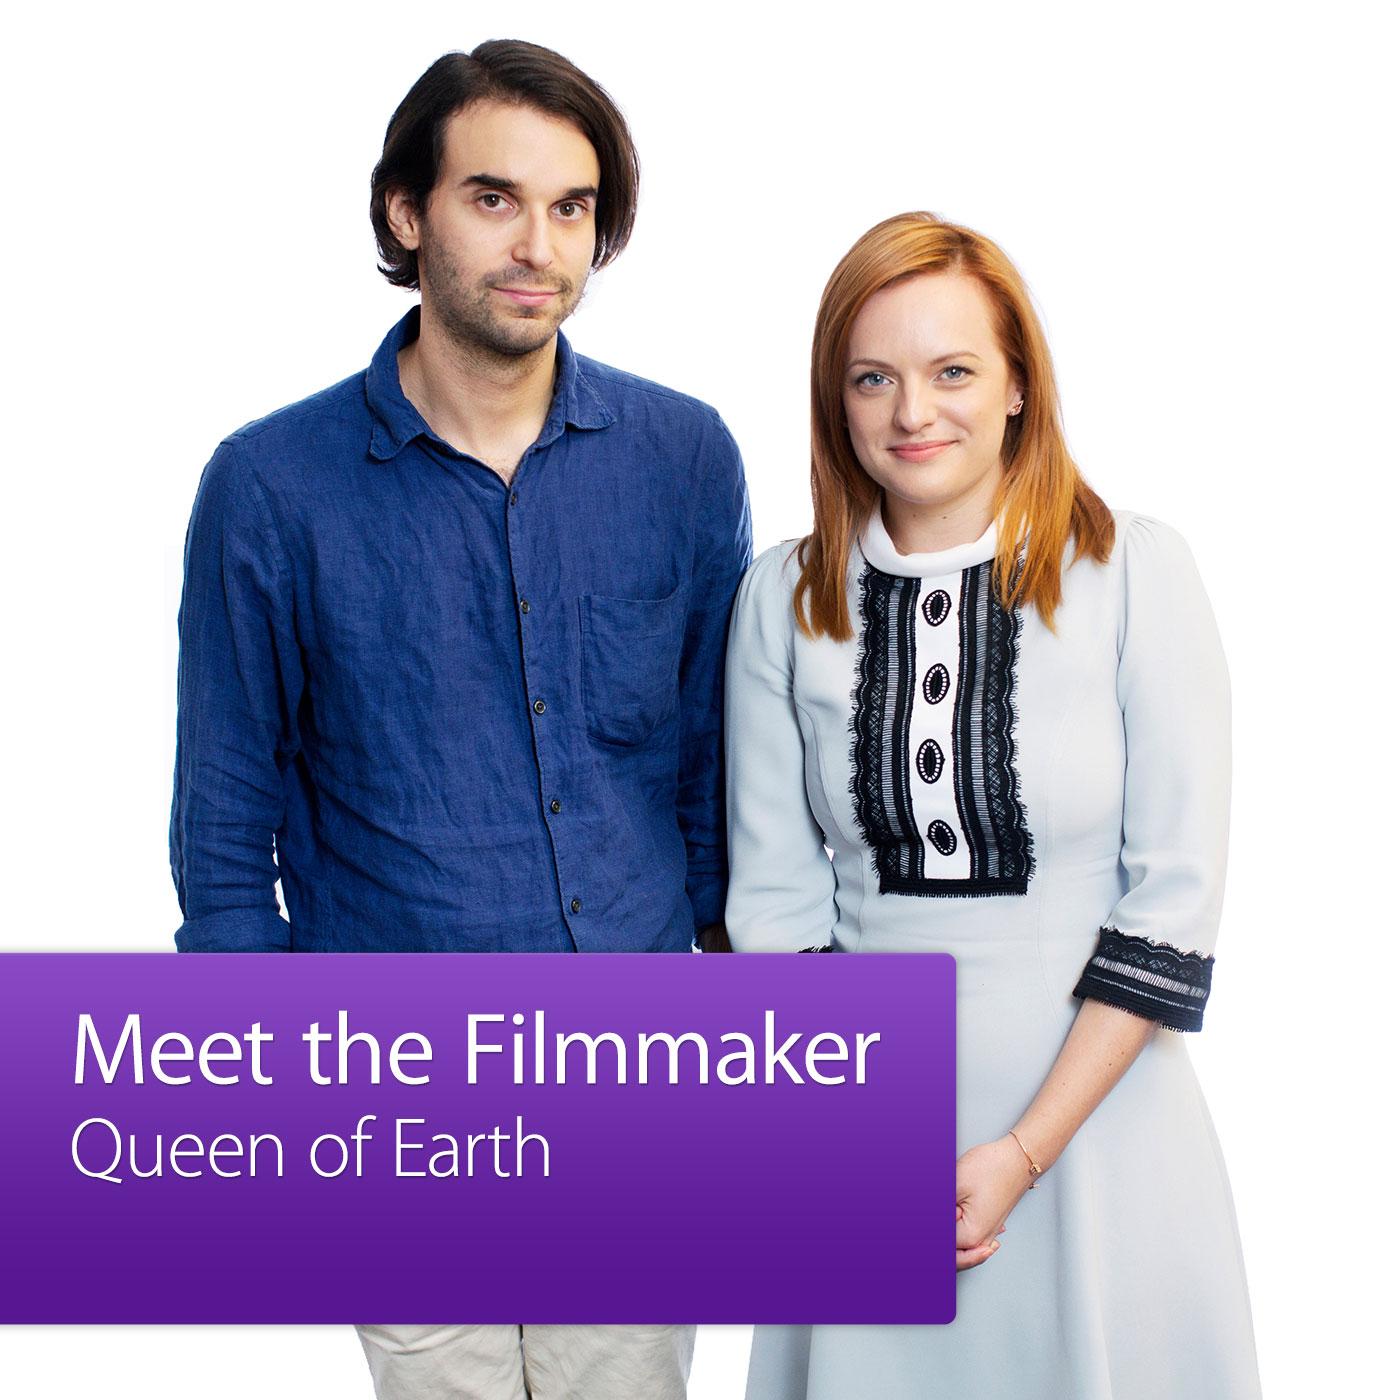 Queen of Earth: Meet the Filmmaker